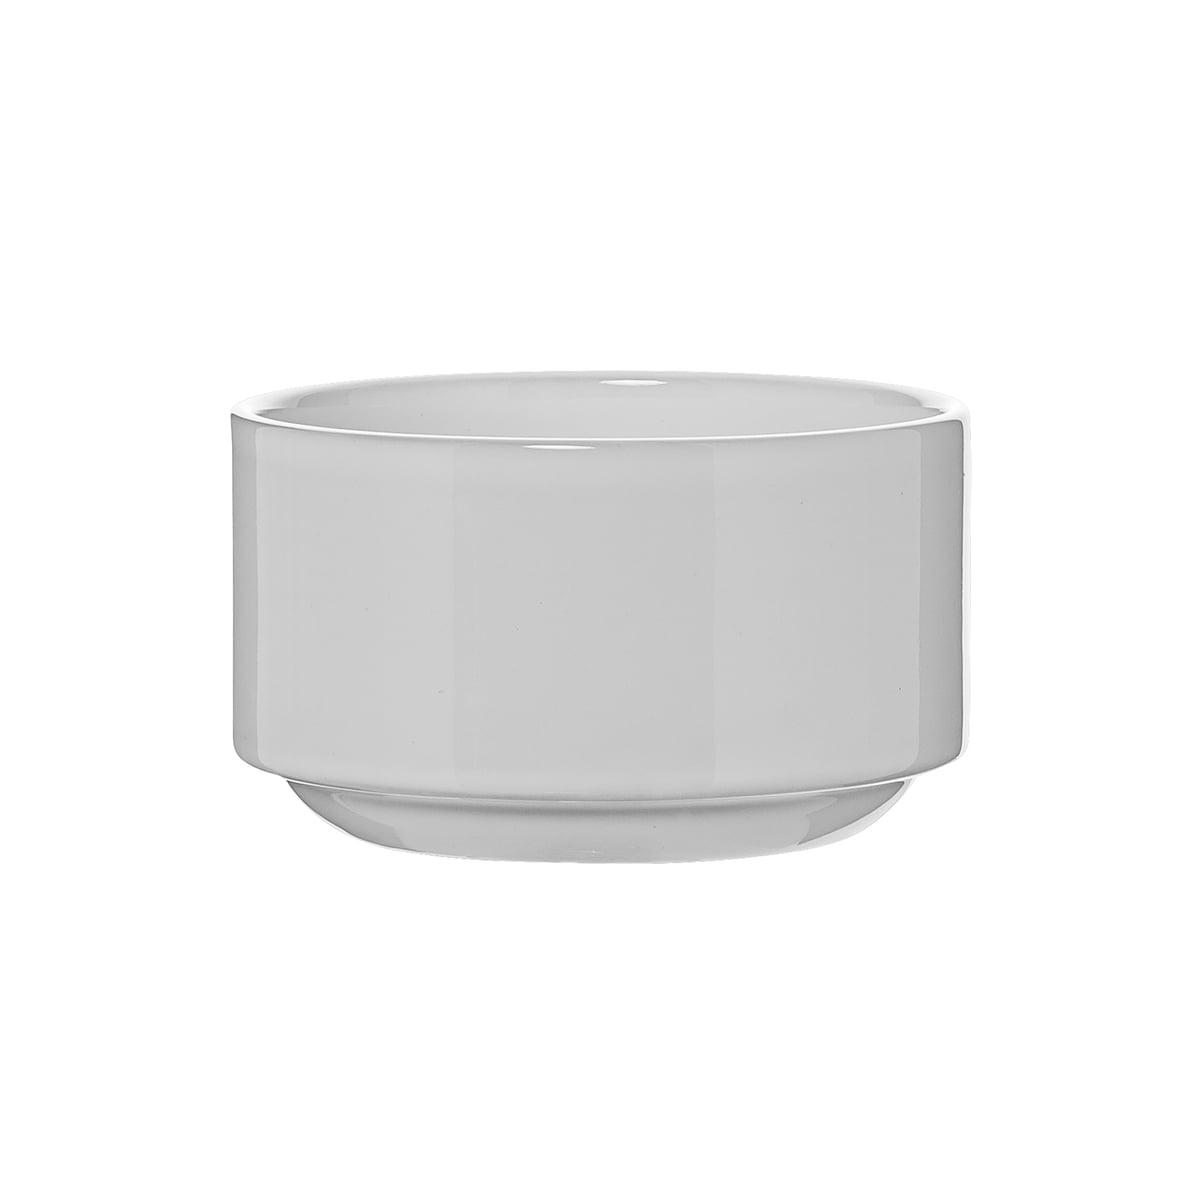 Bloomingville - Blumentopf Ø 13,5 cm, weiß